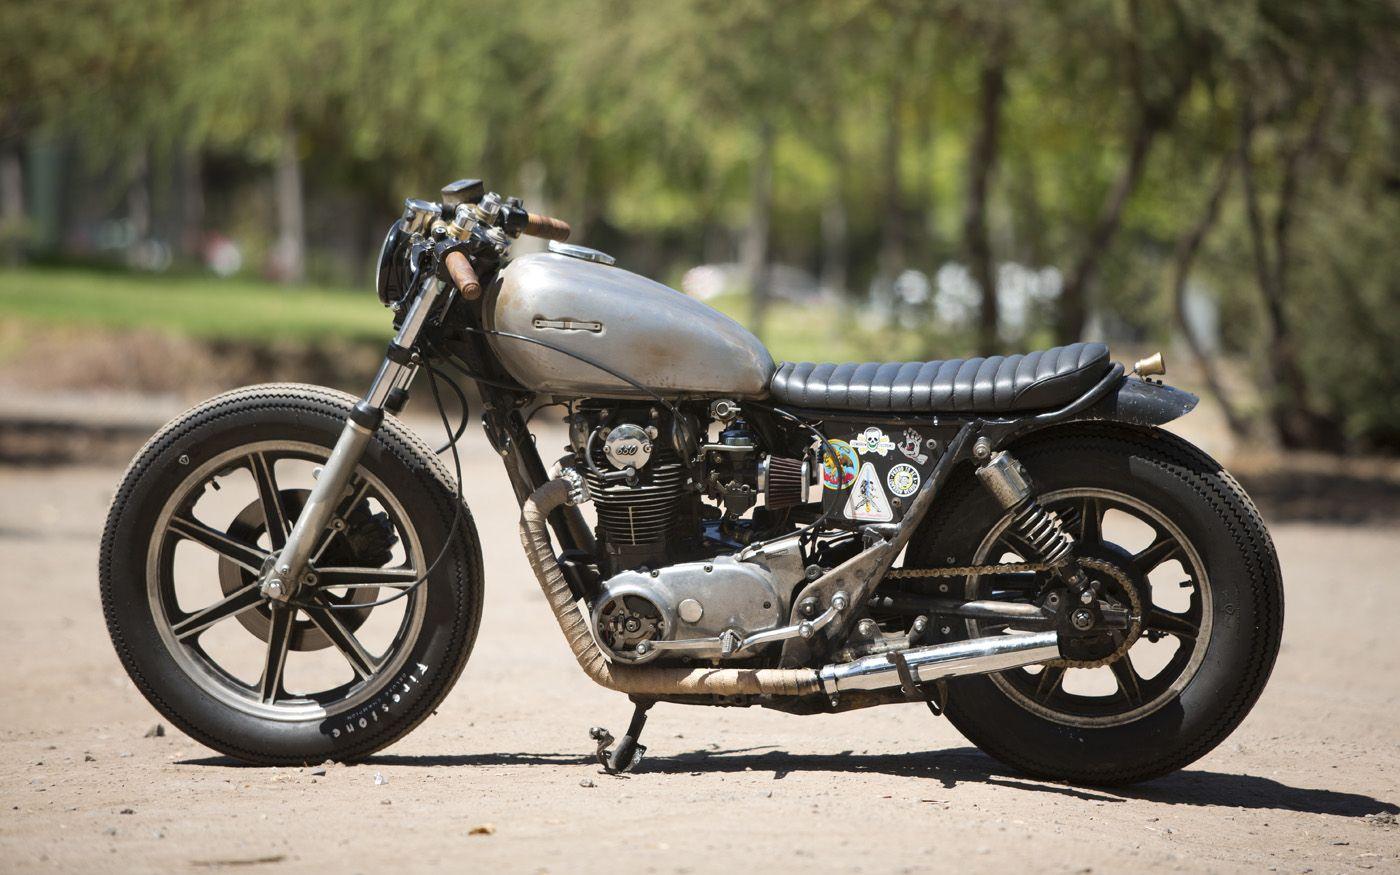 86 Mc 2 Custom Bikes Cafe Racers Brat Bike Motorcycle